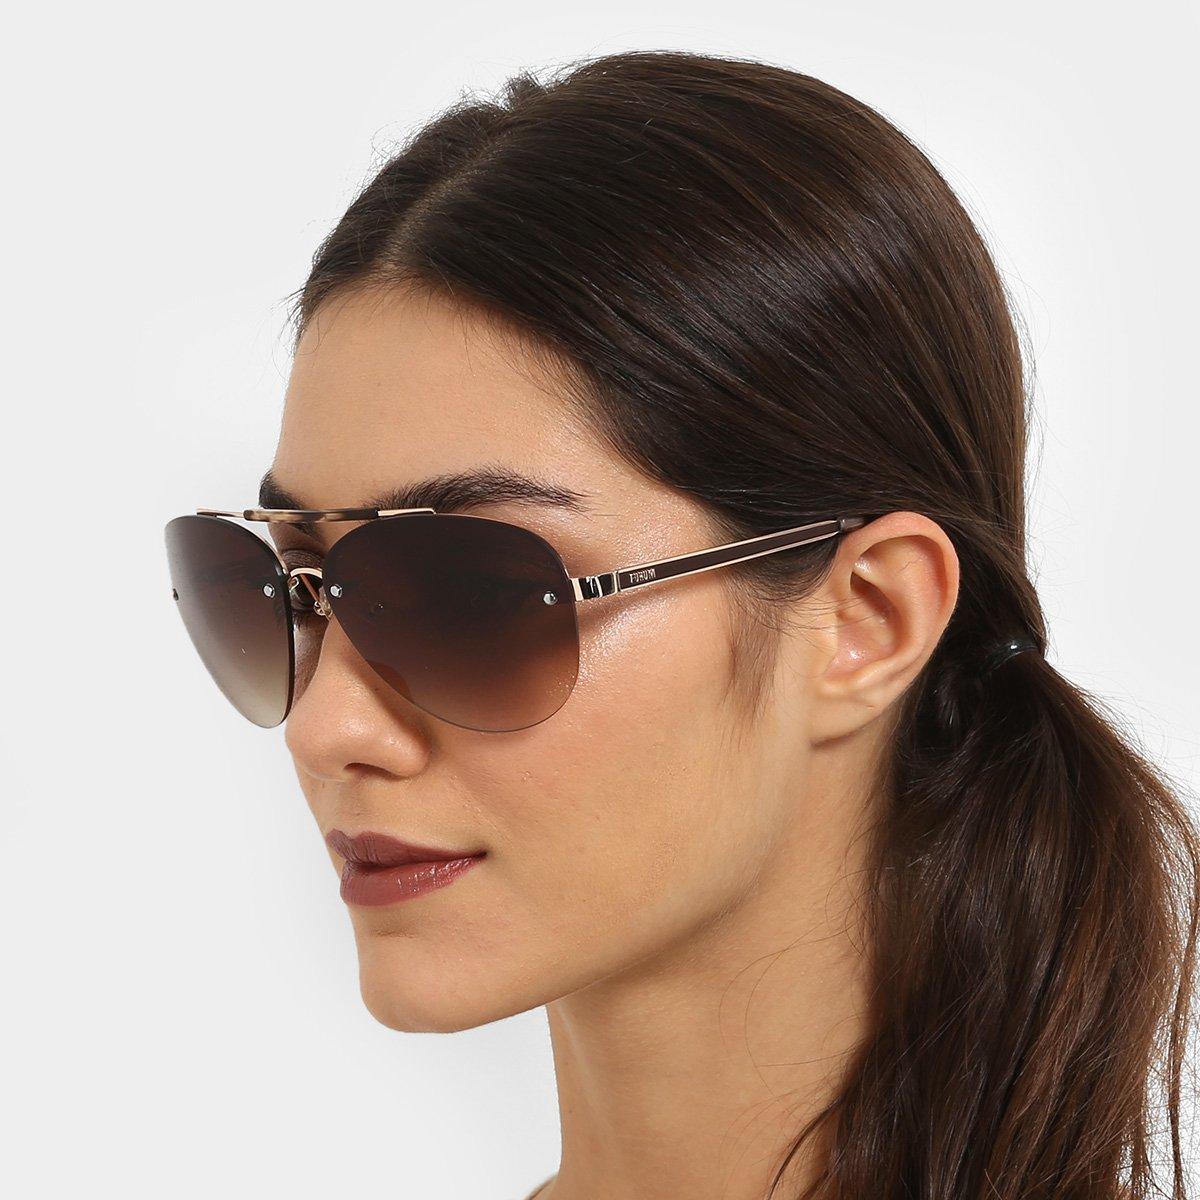 c47891ee9559b Óculos de Sol Forum Dourado Marrom Masculino - Compre Agora